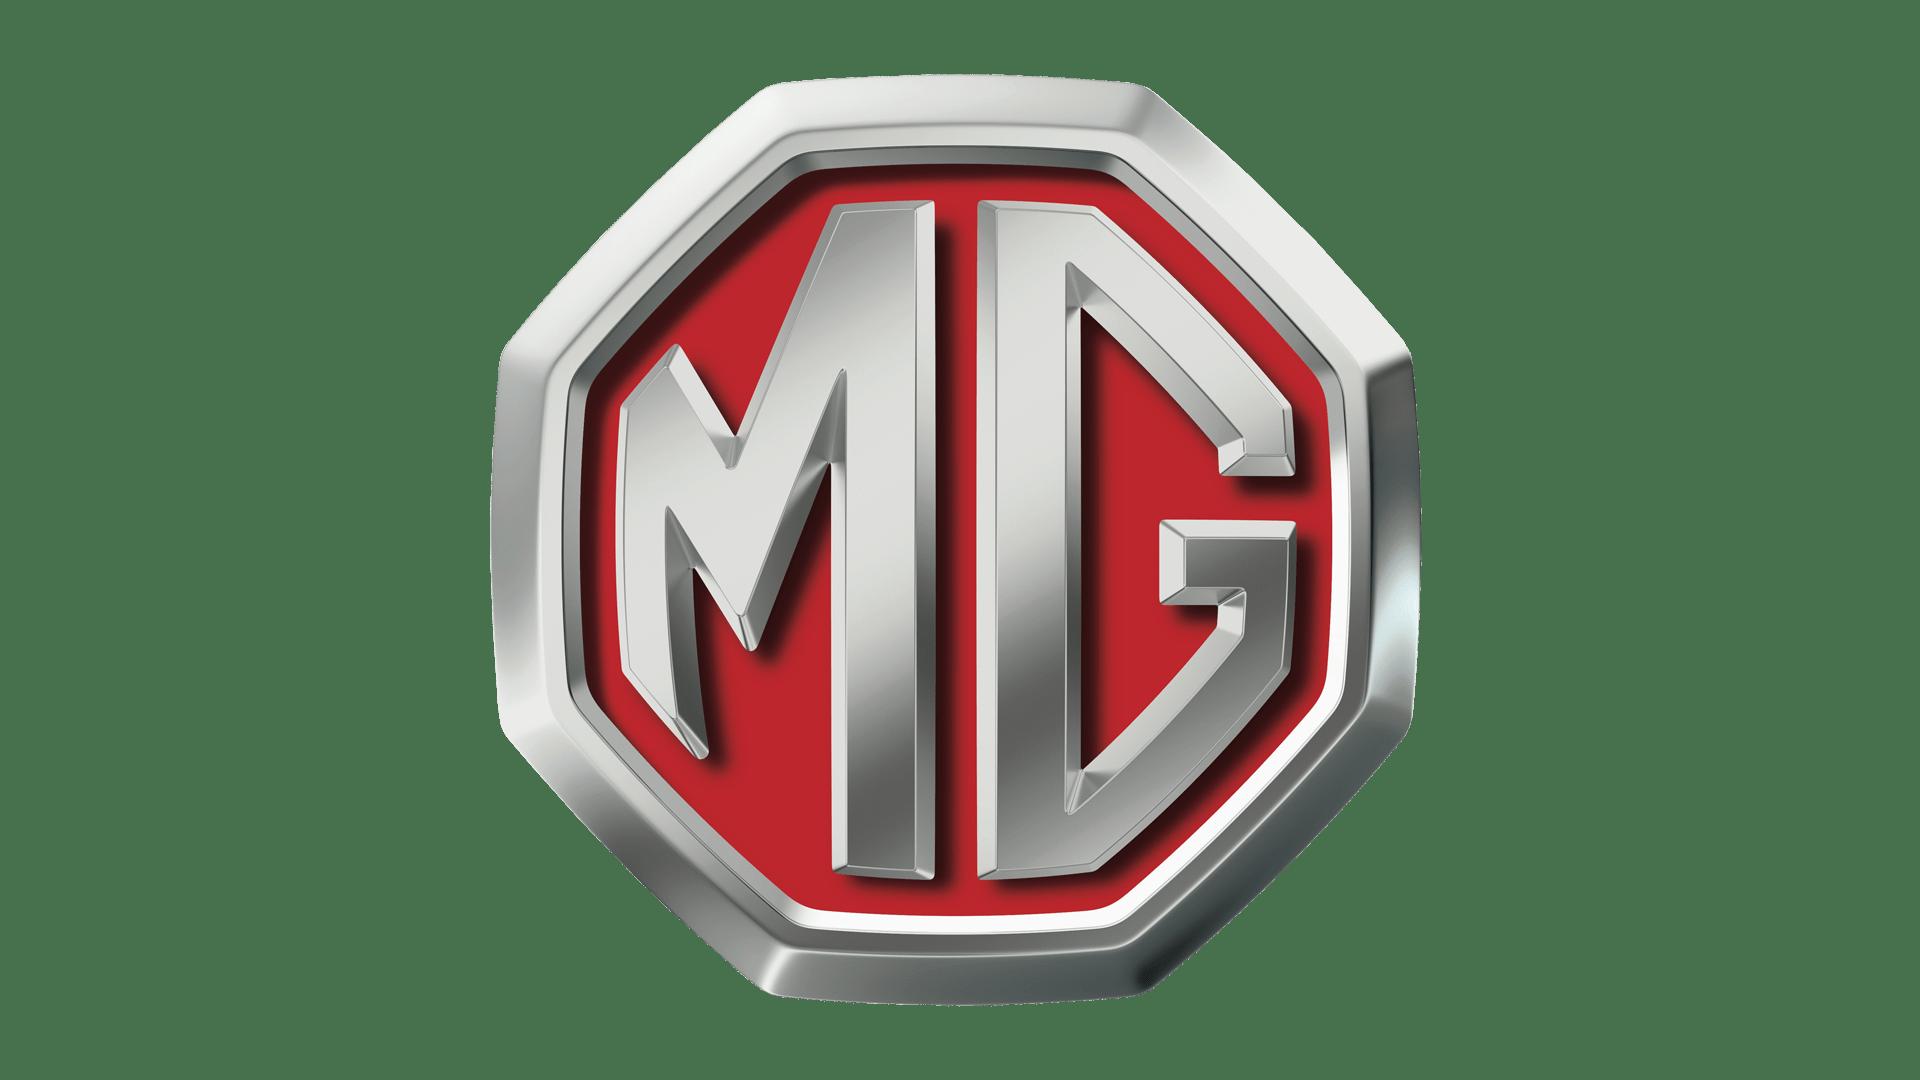 Логотип MG (Morris Garage)